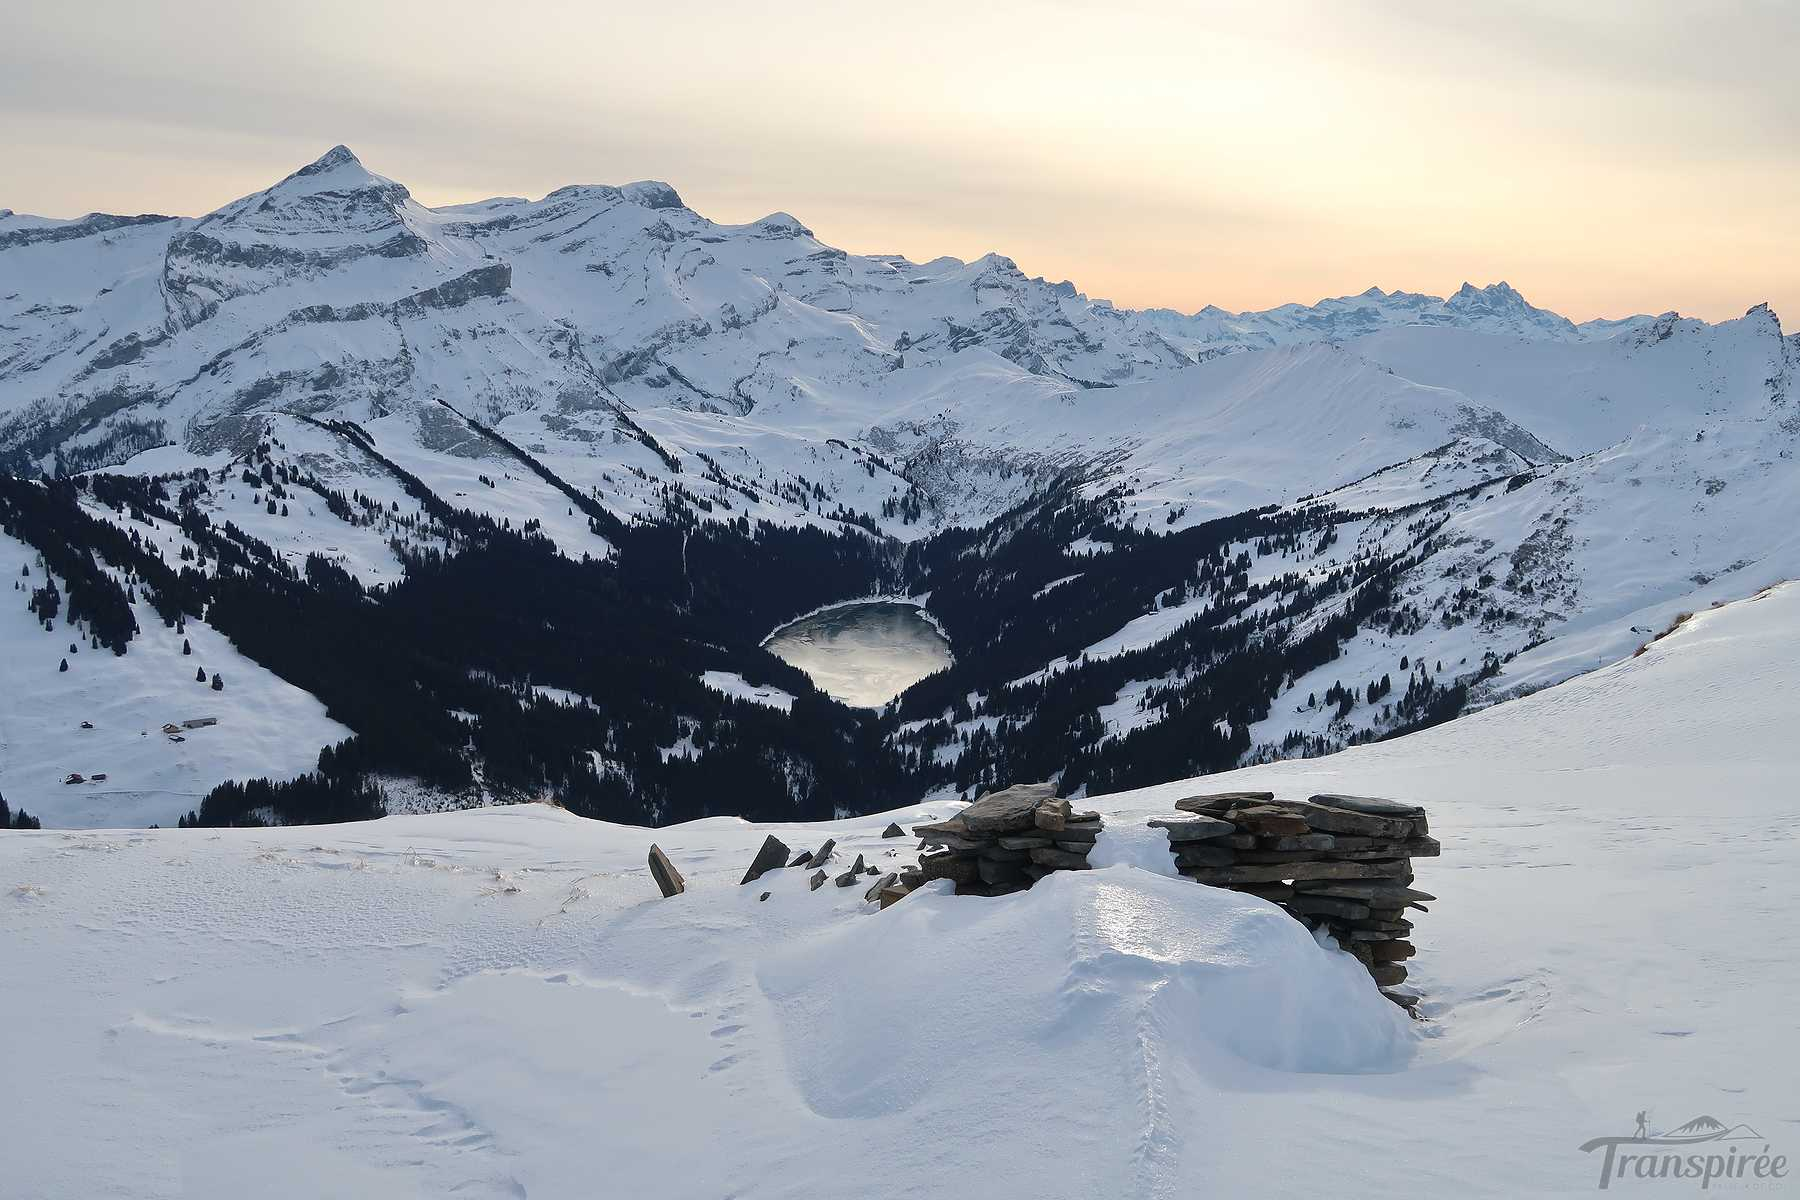 Randonnée en raquettes au Stadehore depuis Grund bei Gstaad